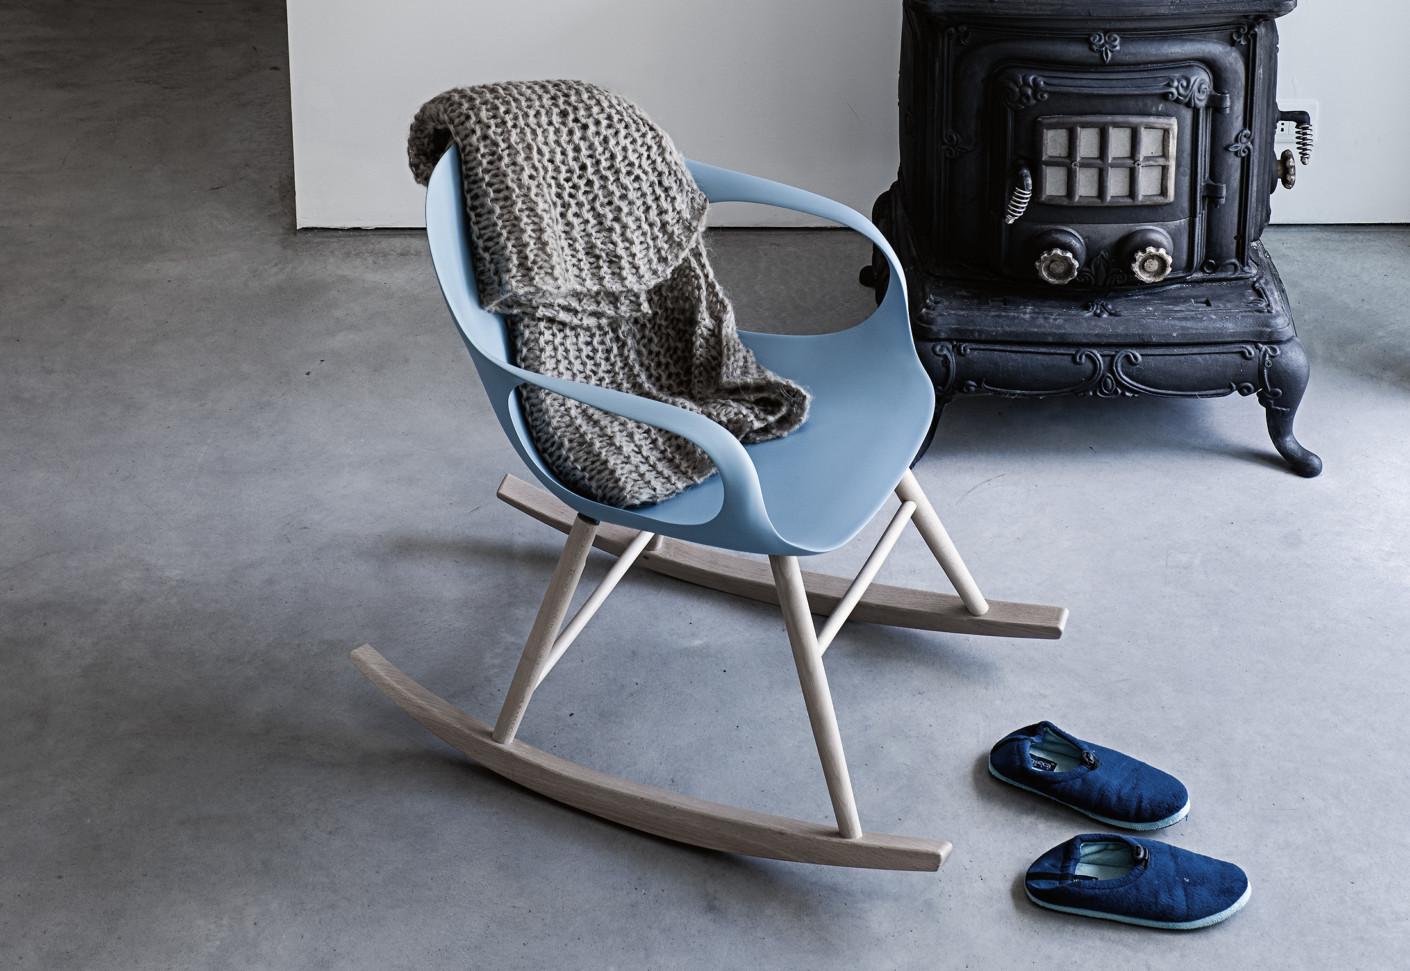 Hmedata npi search registry - Folding Floor Rocking Chair